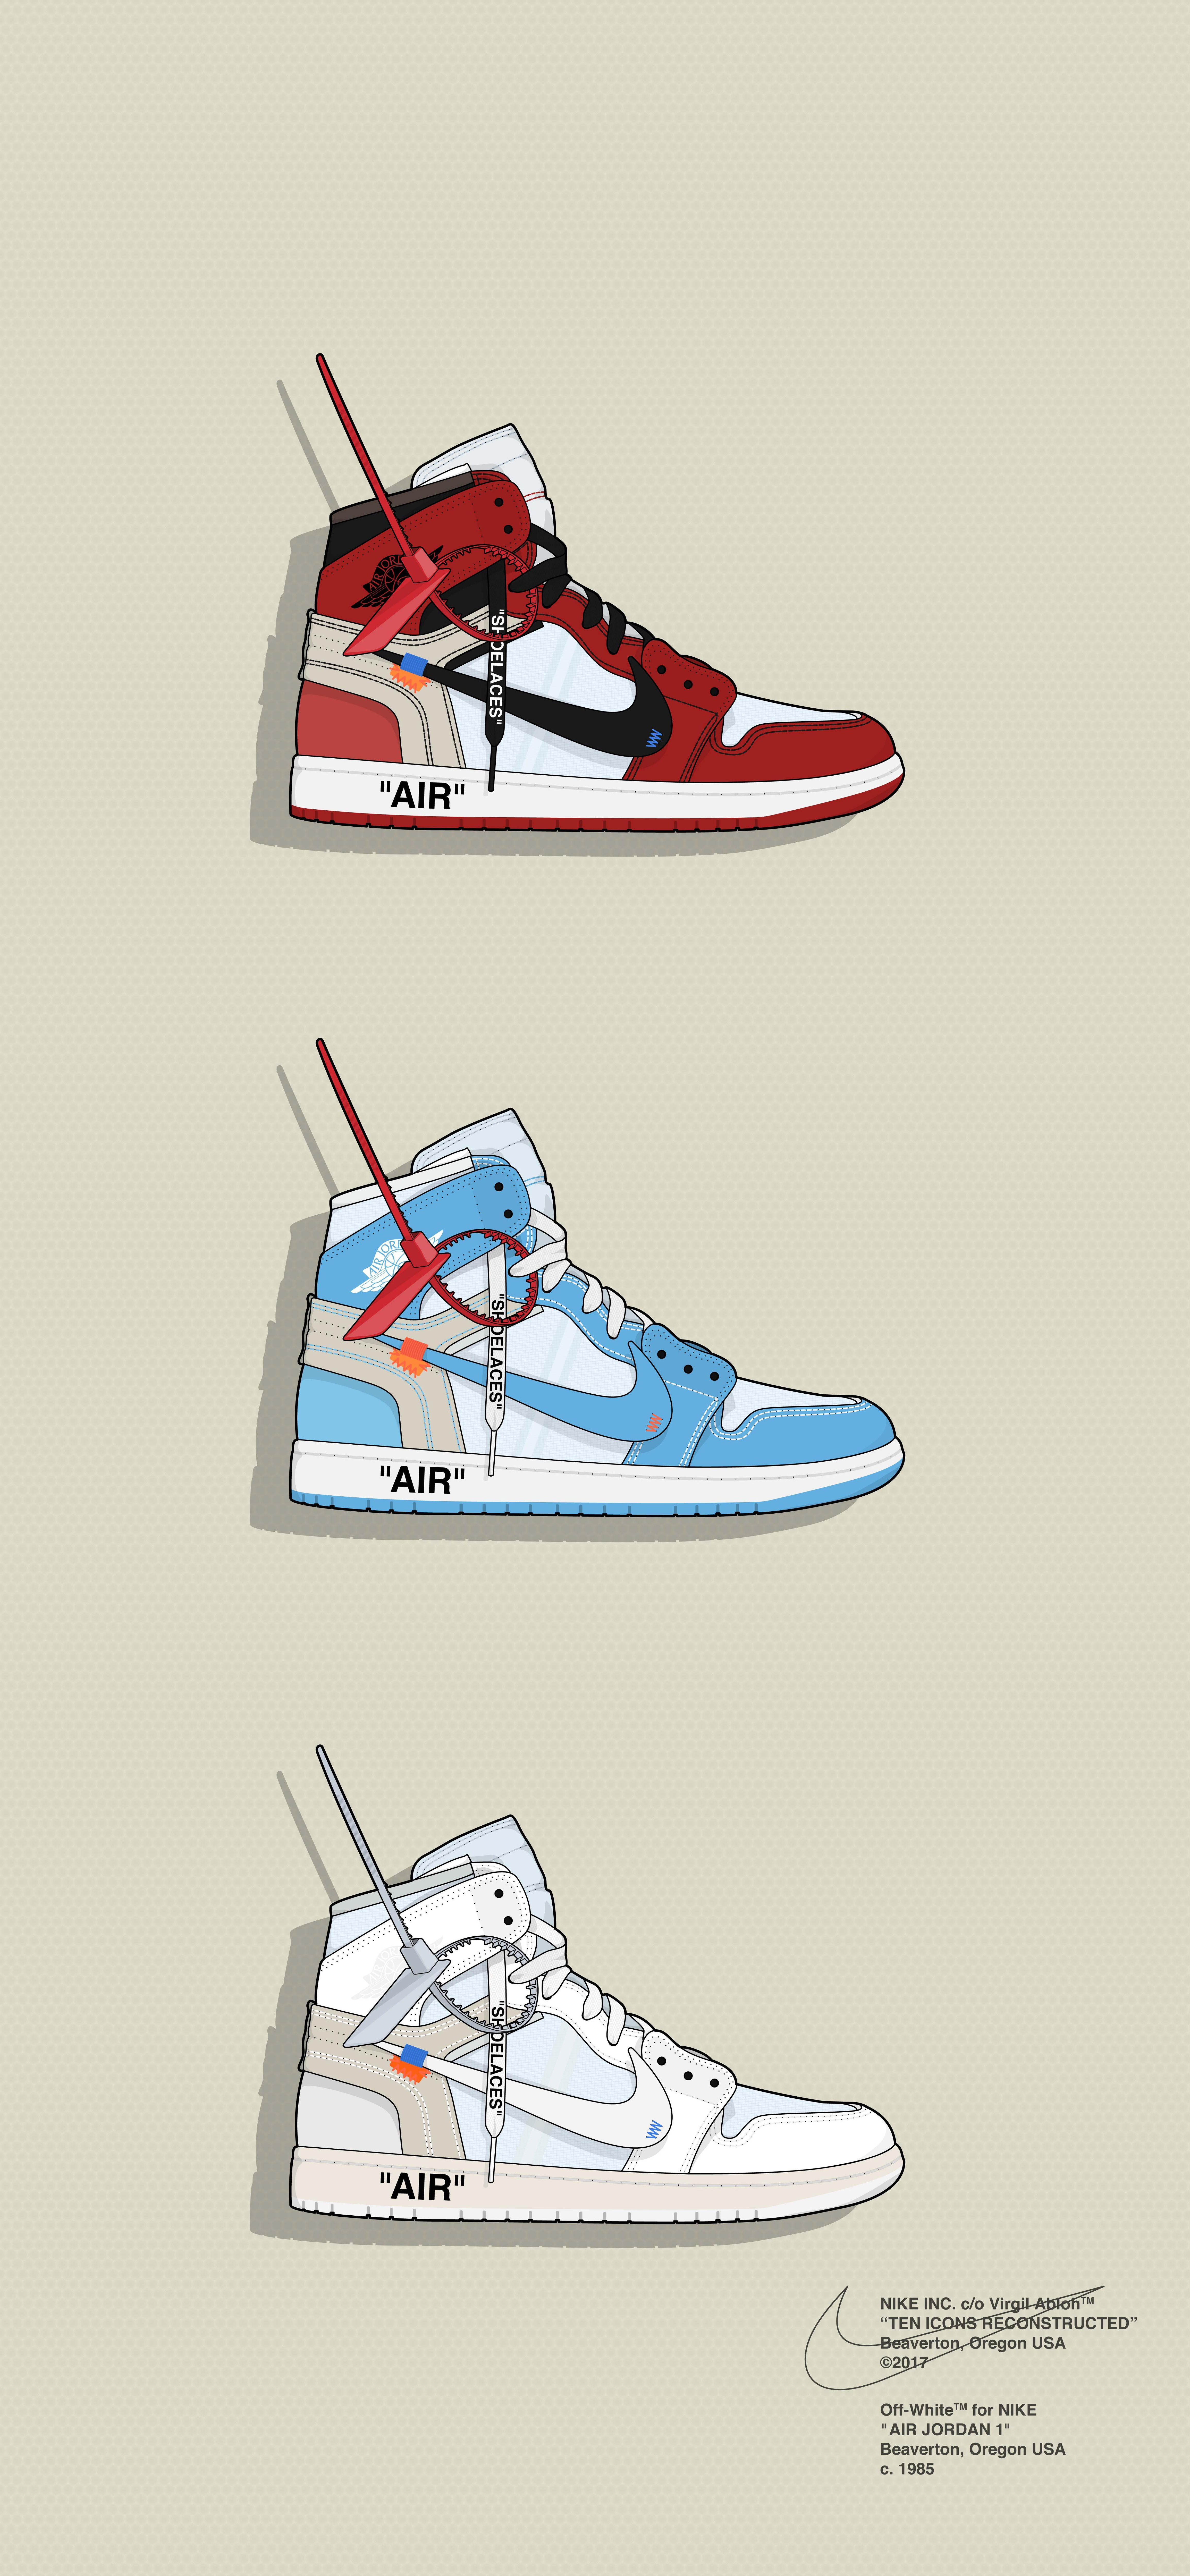 Air Jordan 1 Wallpaper Posted By Ethan Walker